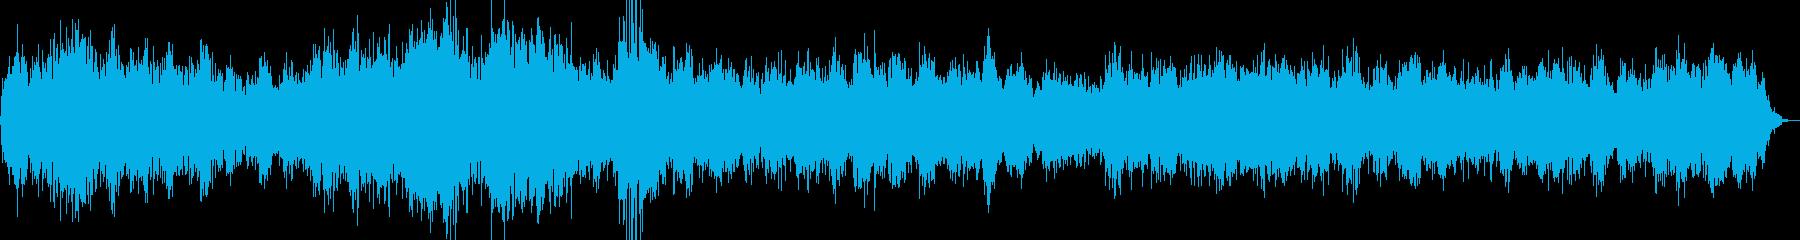 Metal-Distort-Tex...の再生済みの波形